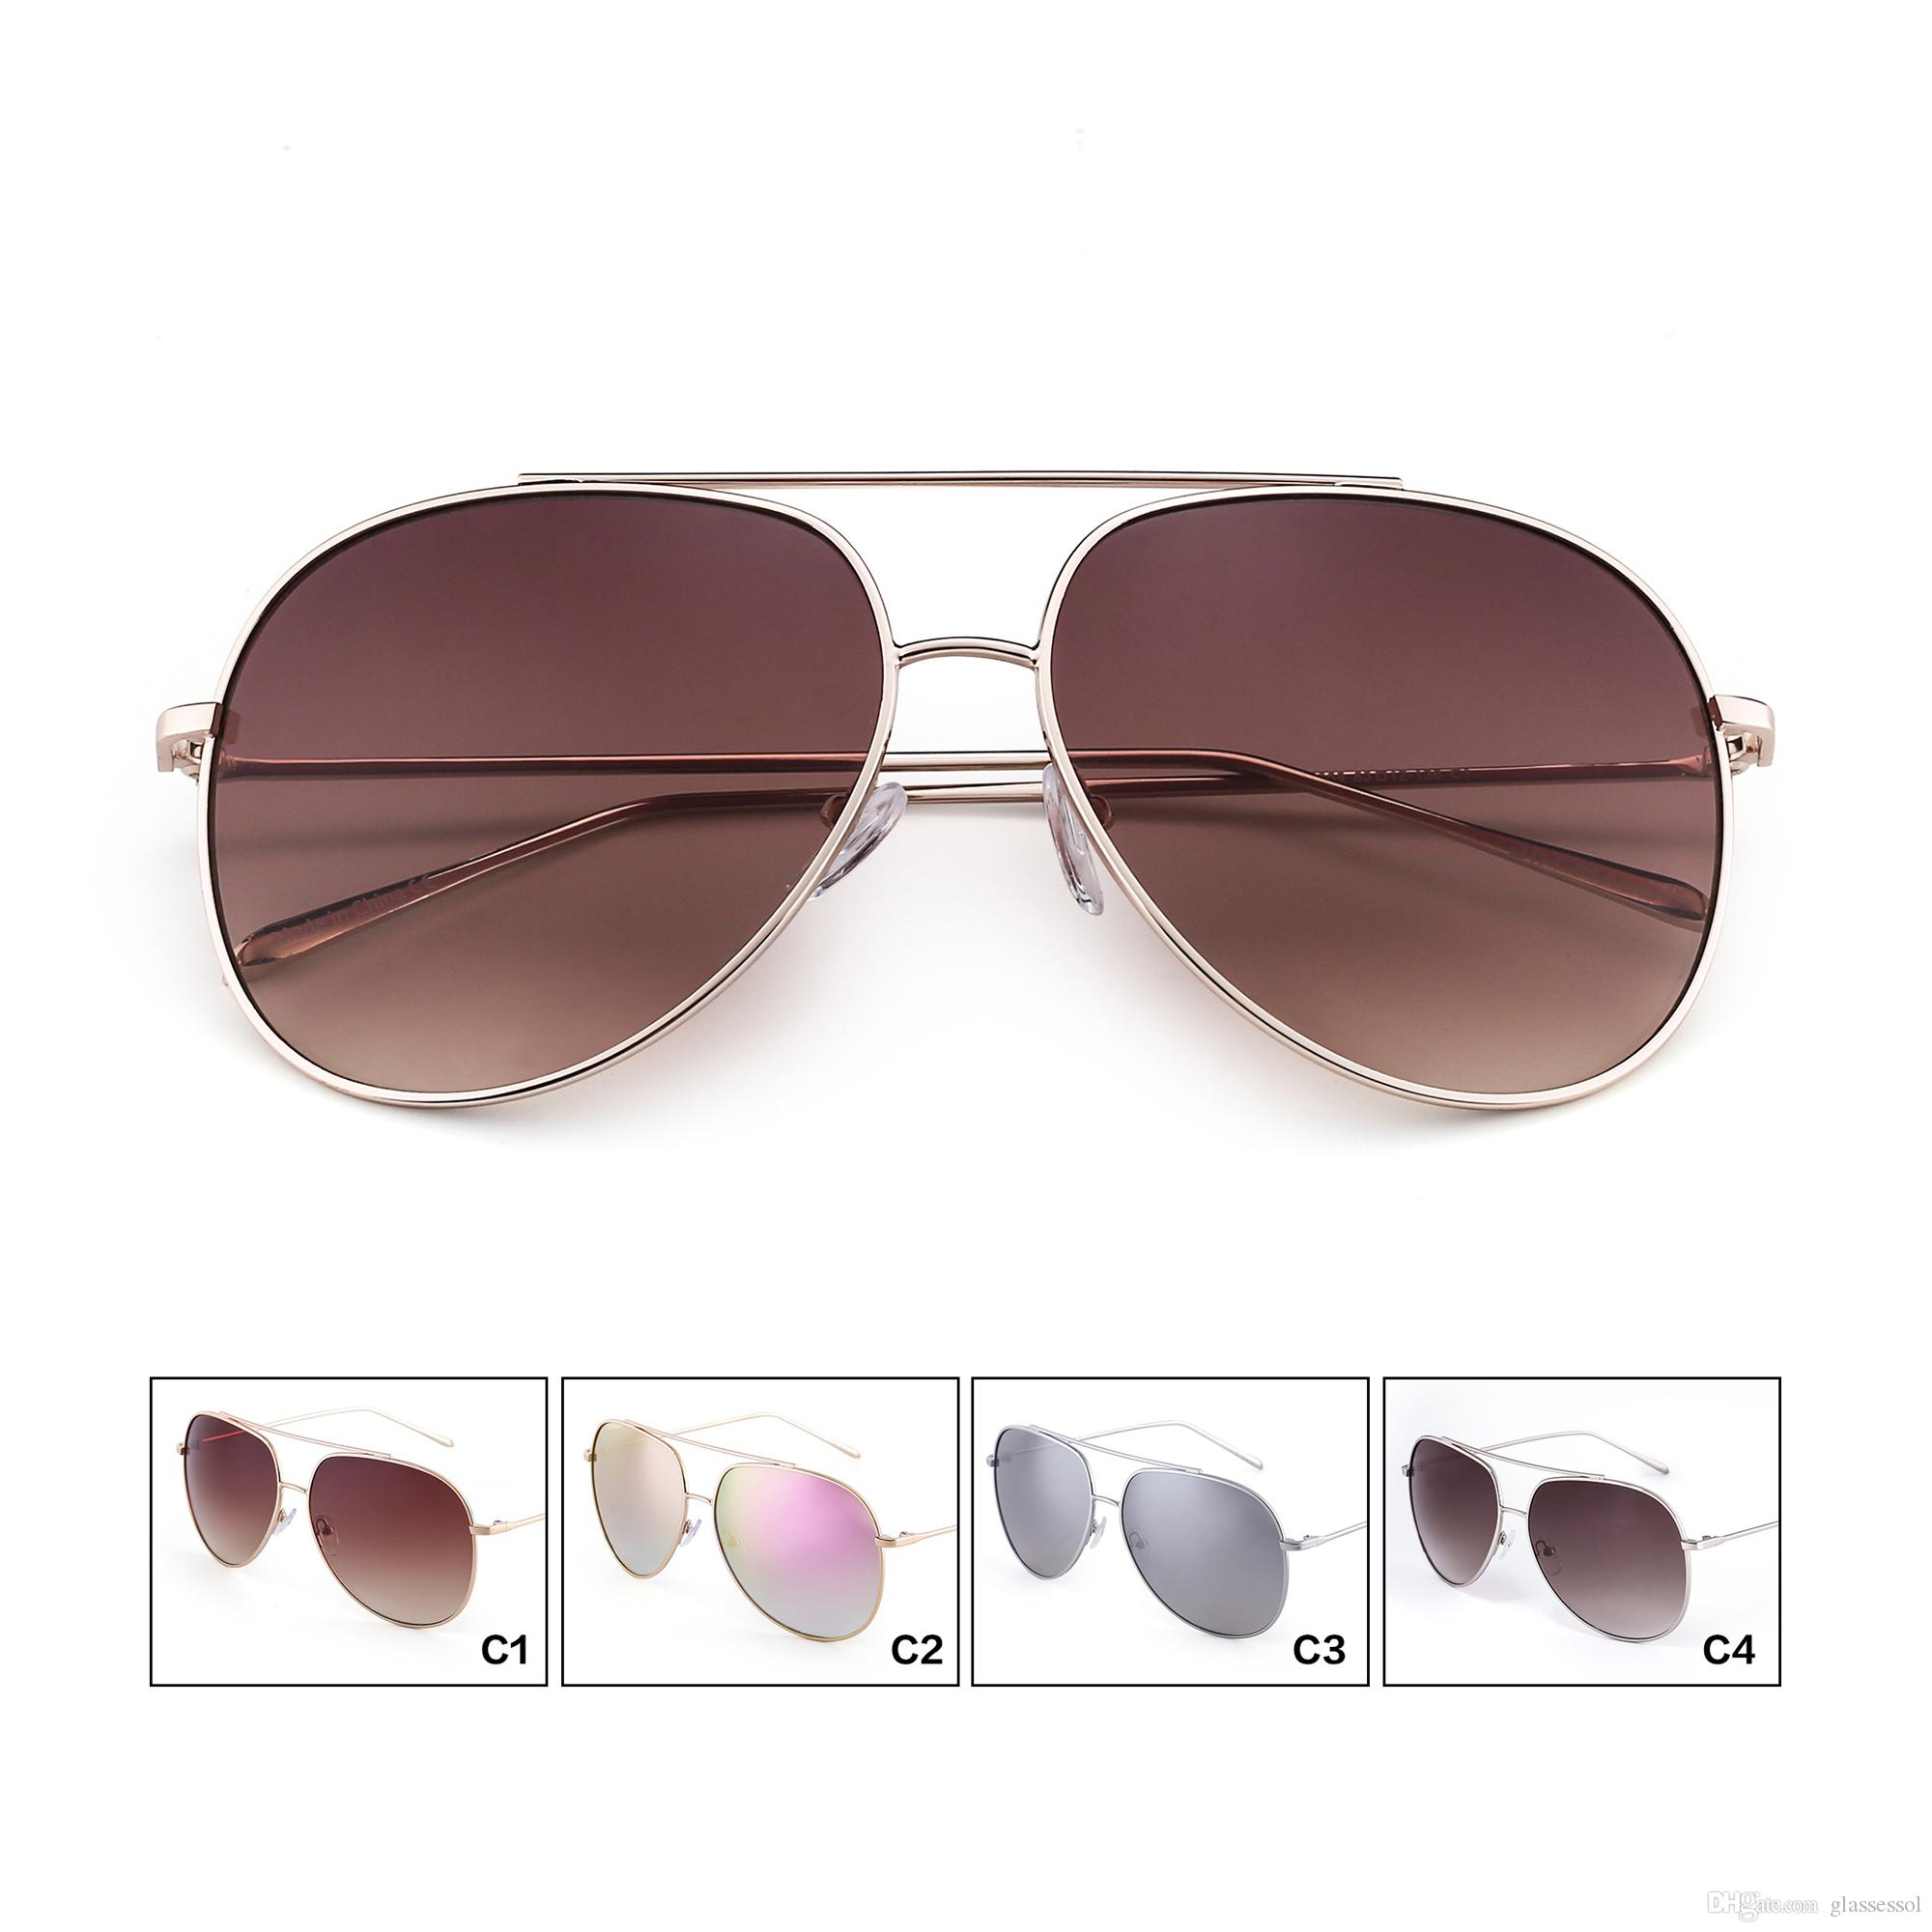 2018 High Quality Brand Sun Glasses Low Price Oversized Aviator ... 78c8b539a6